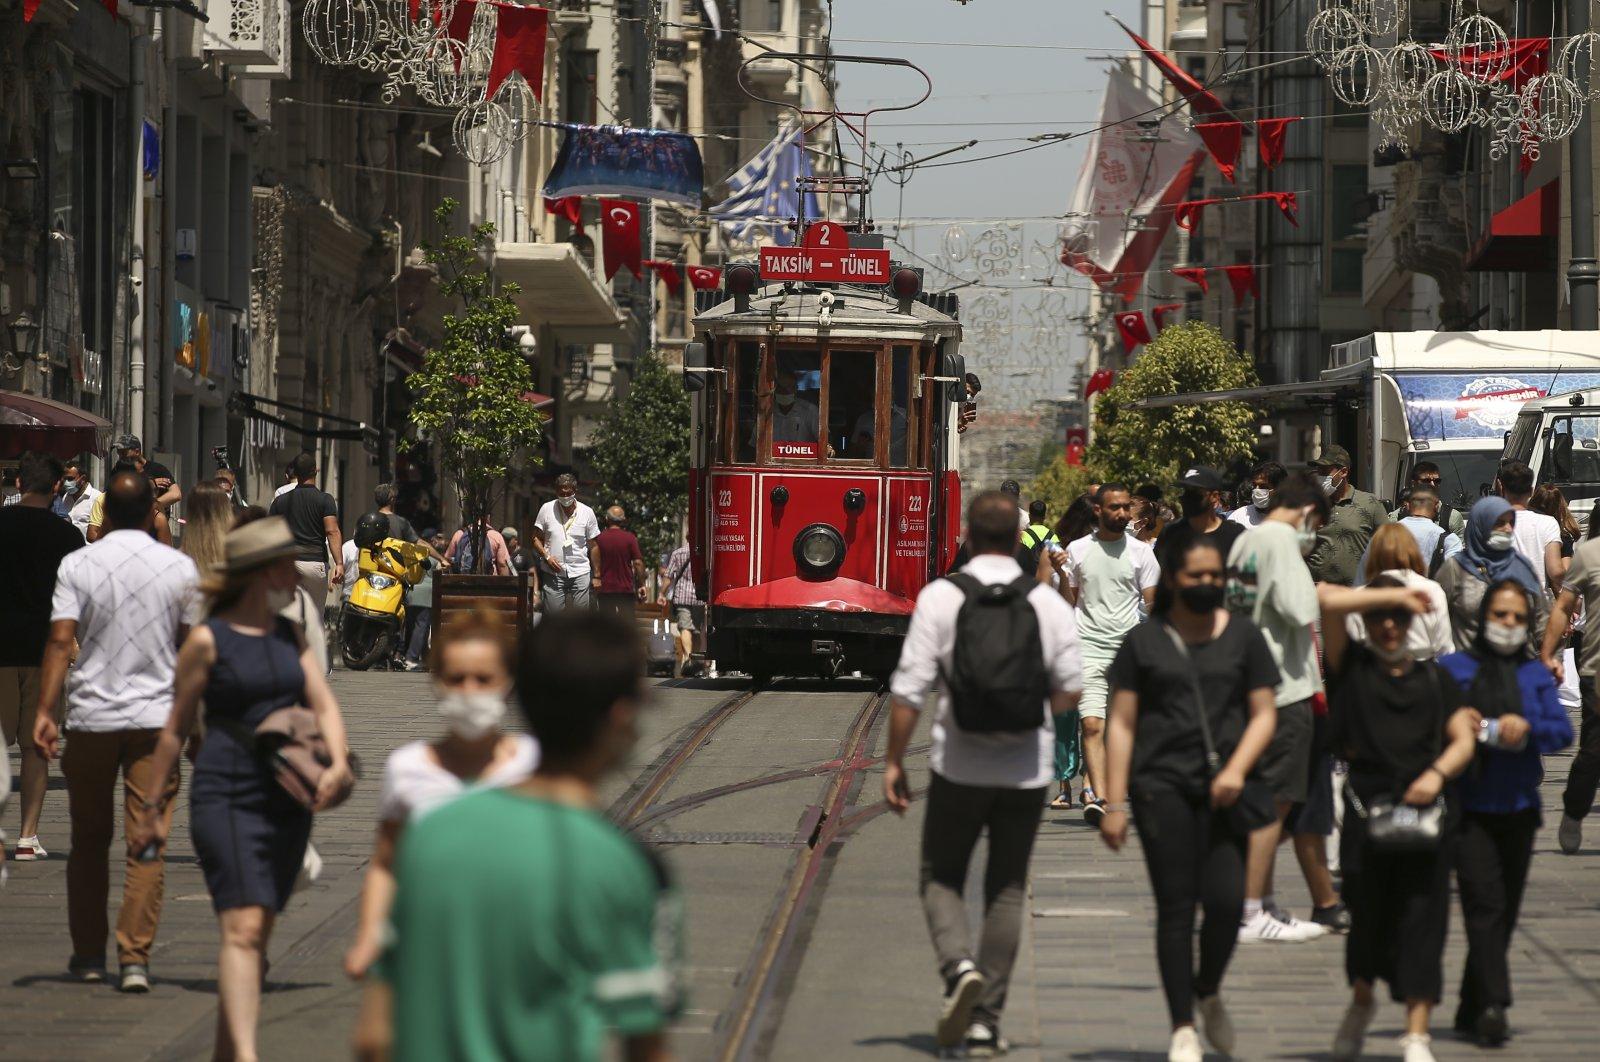 People walk on Istiklal Street, the main shopping street in Istanbul, Turkey, July 1, 2021. (AP Photo)